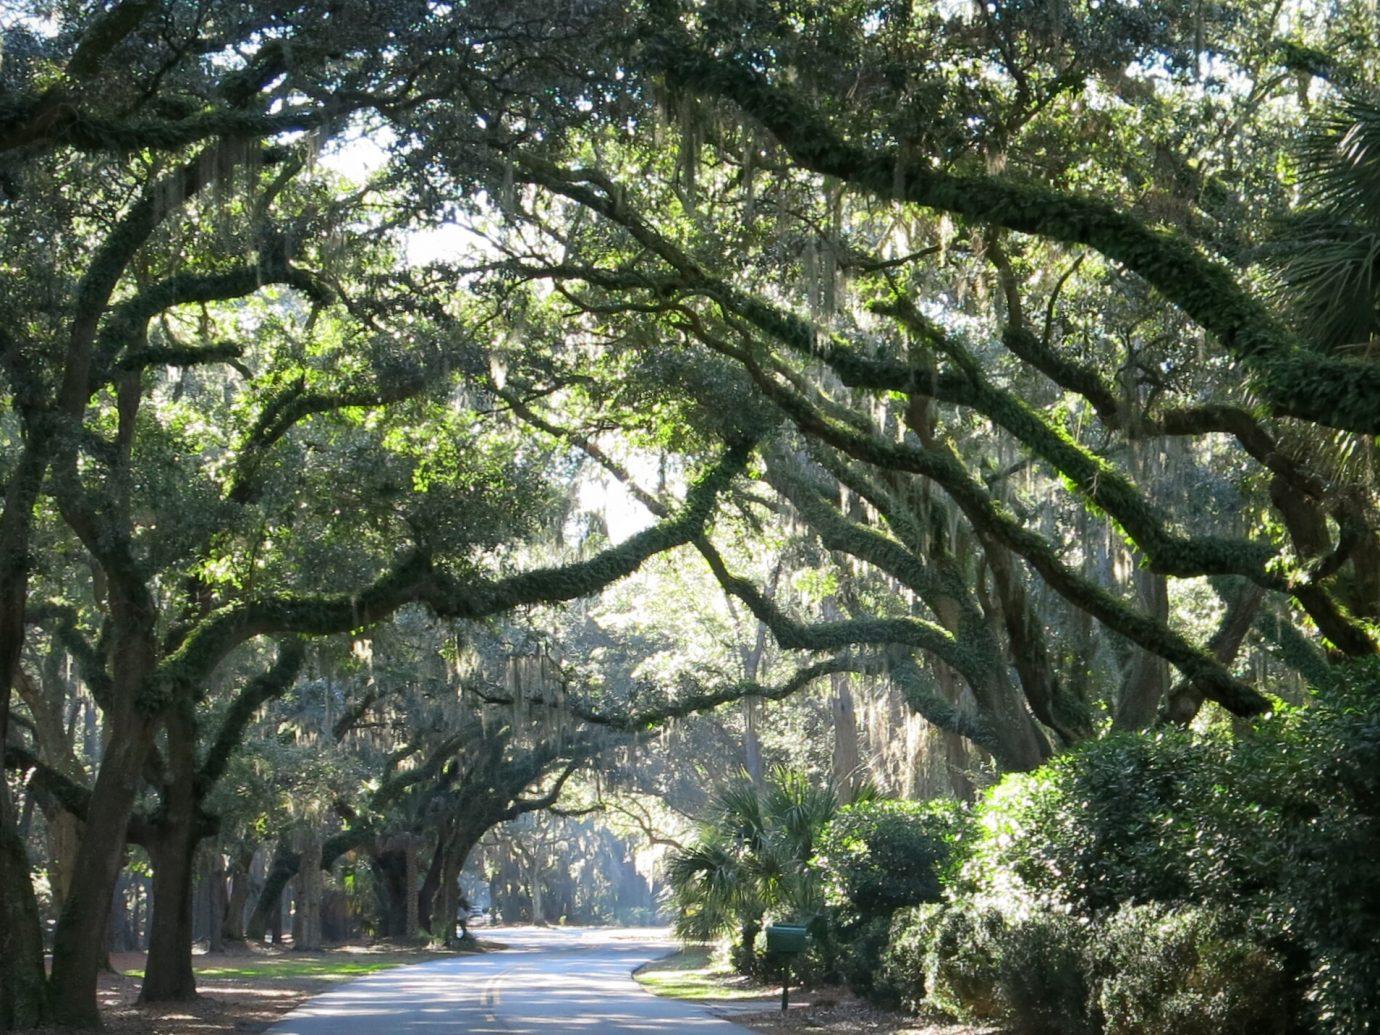 Beautiful Live Oak Trees Canopy Hilton Head Island Road, South Carolina